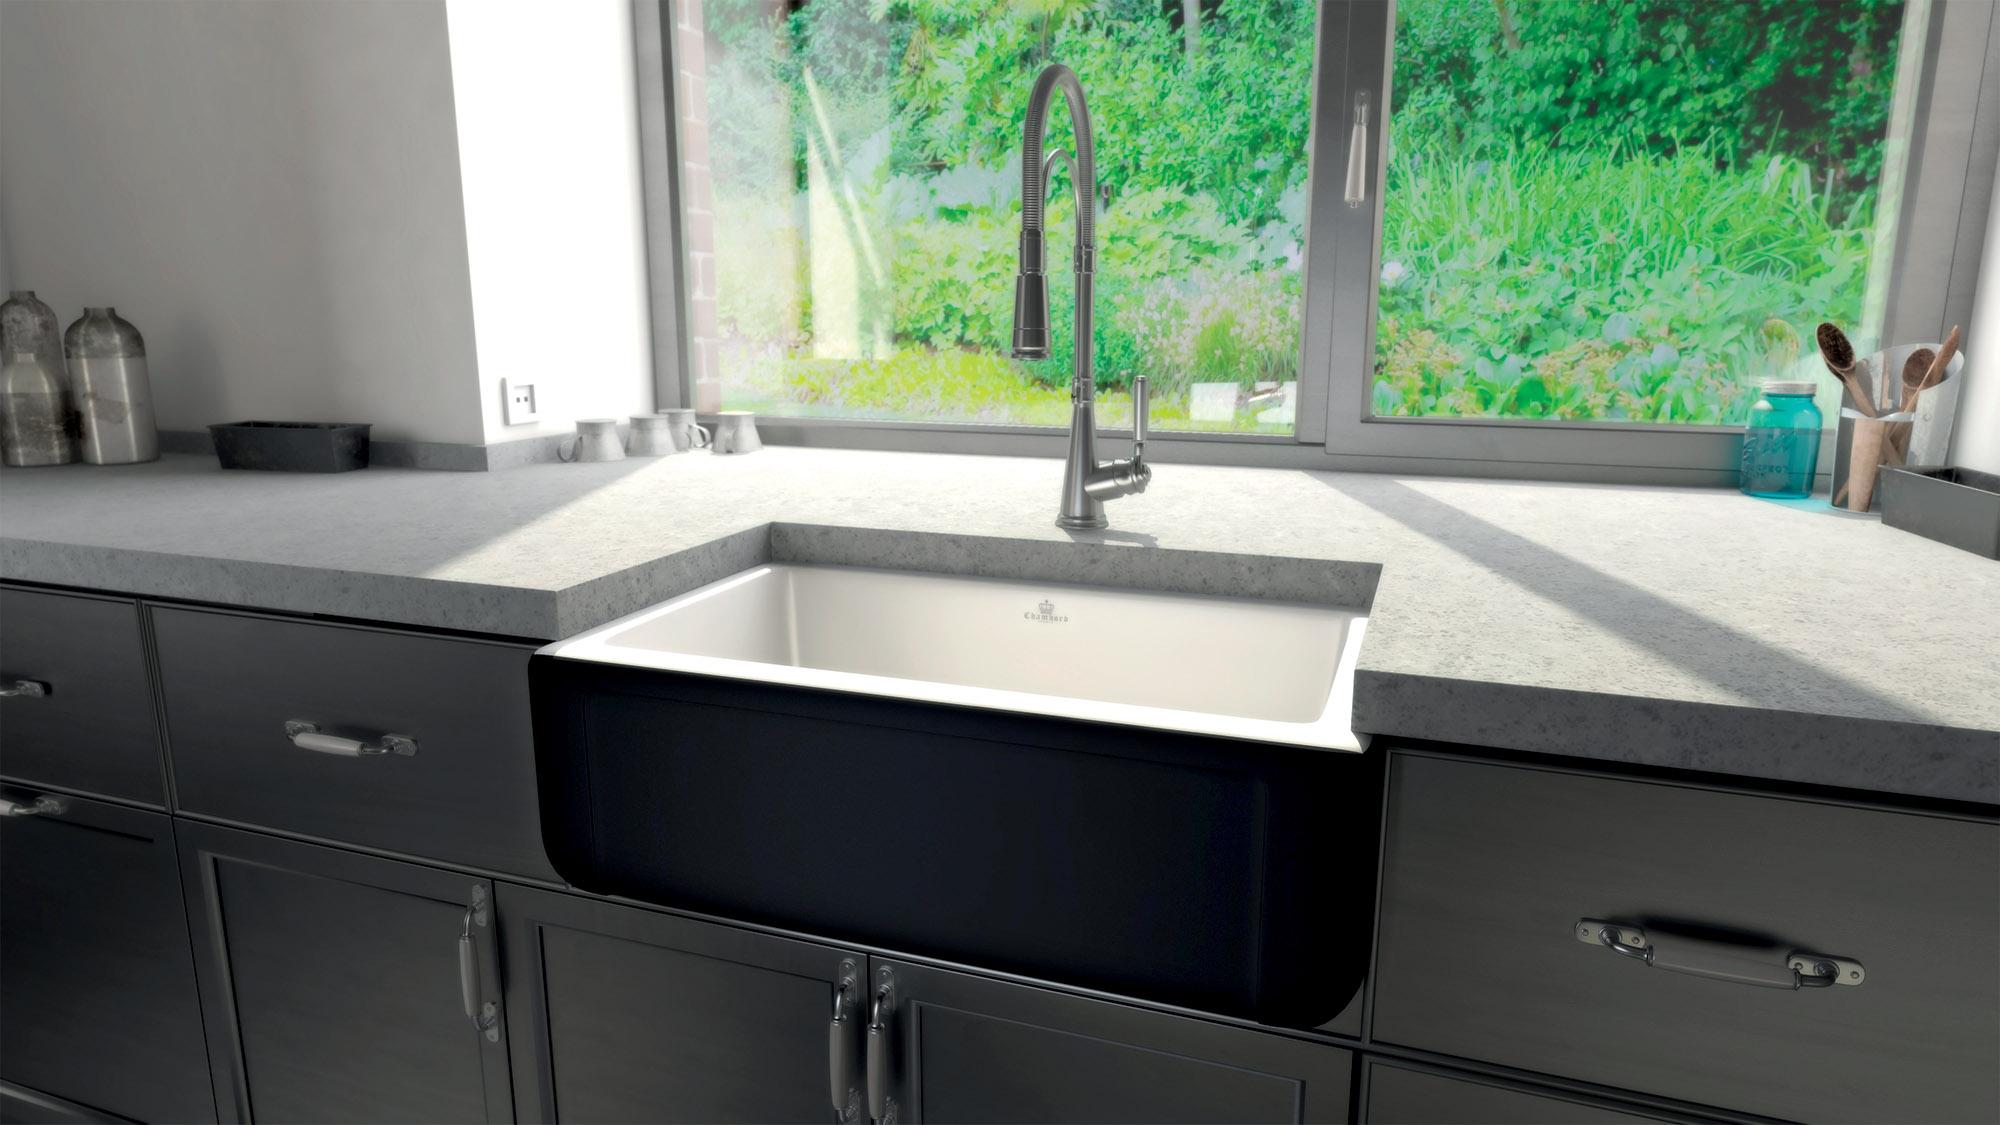 Luxury Kitchen Sinks Farmhouse